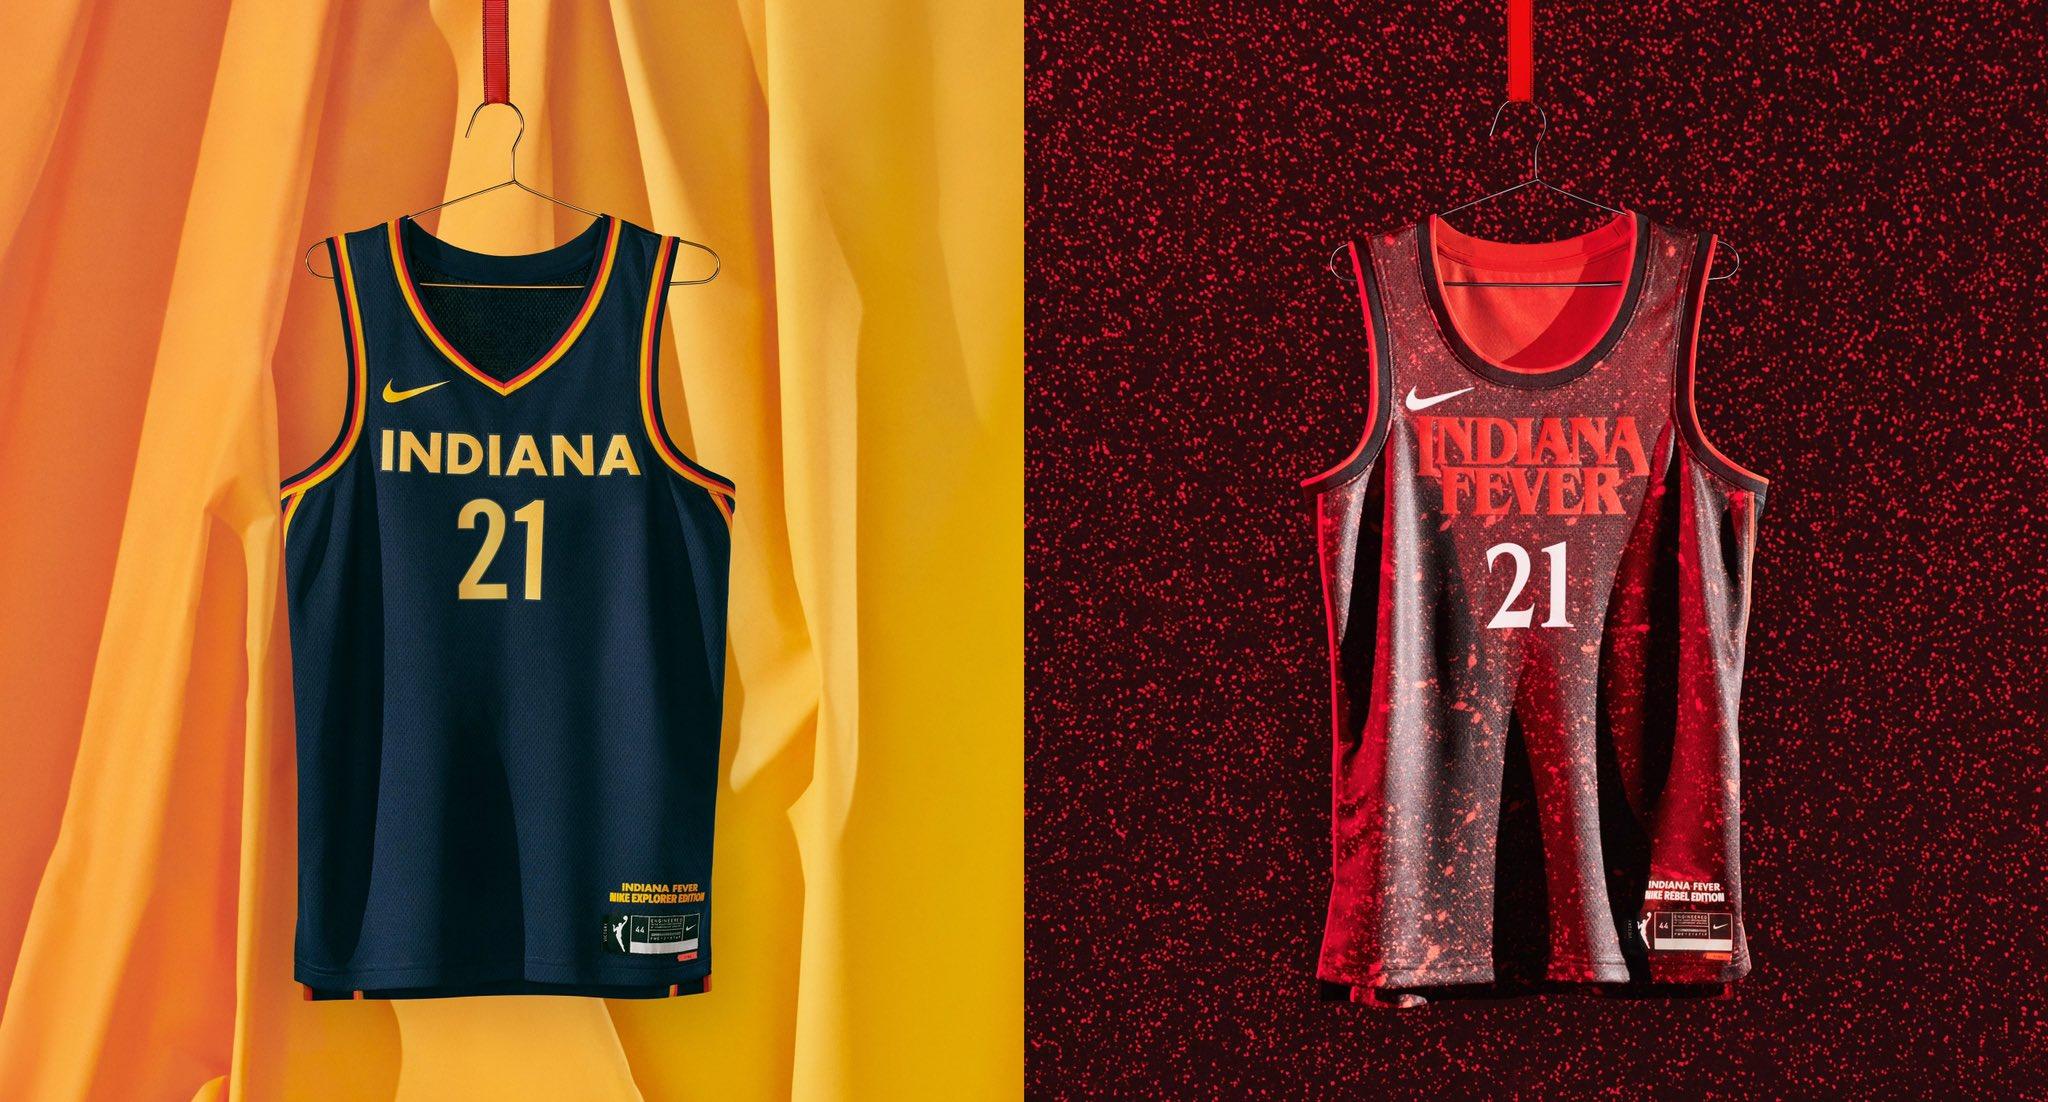 Indiana Fever WNBA jerseys